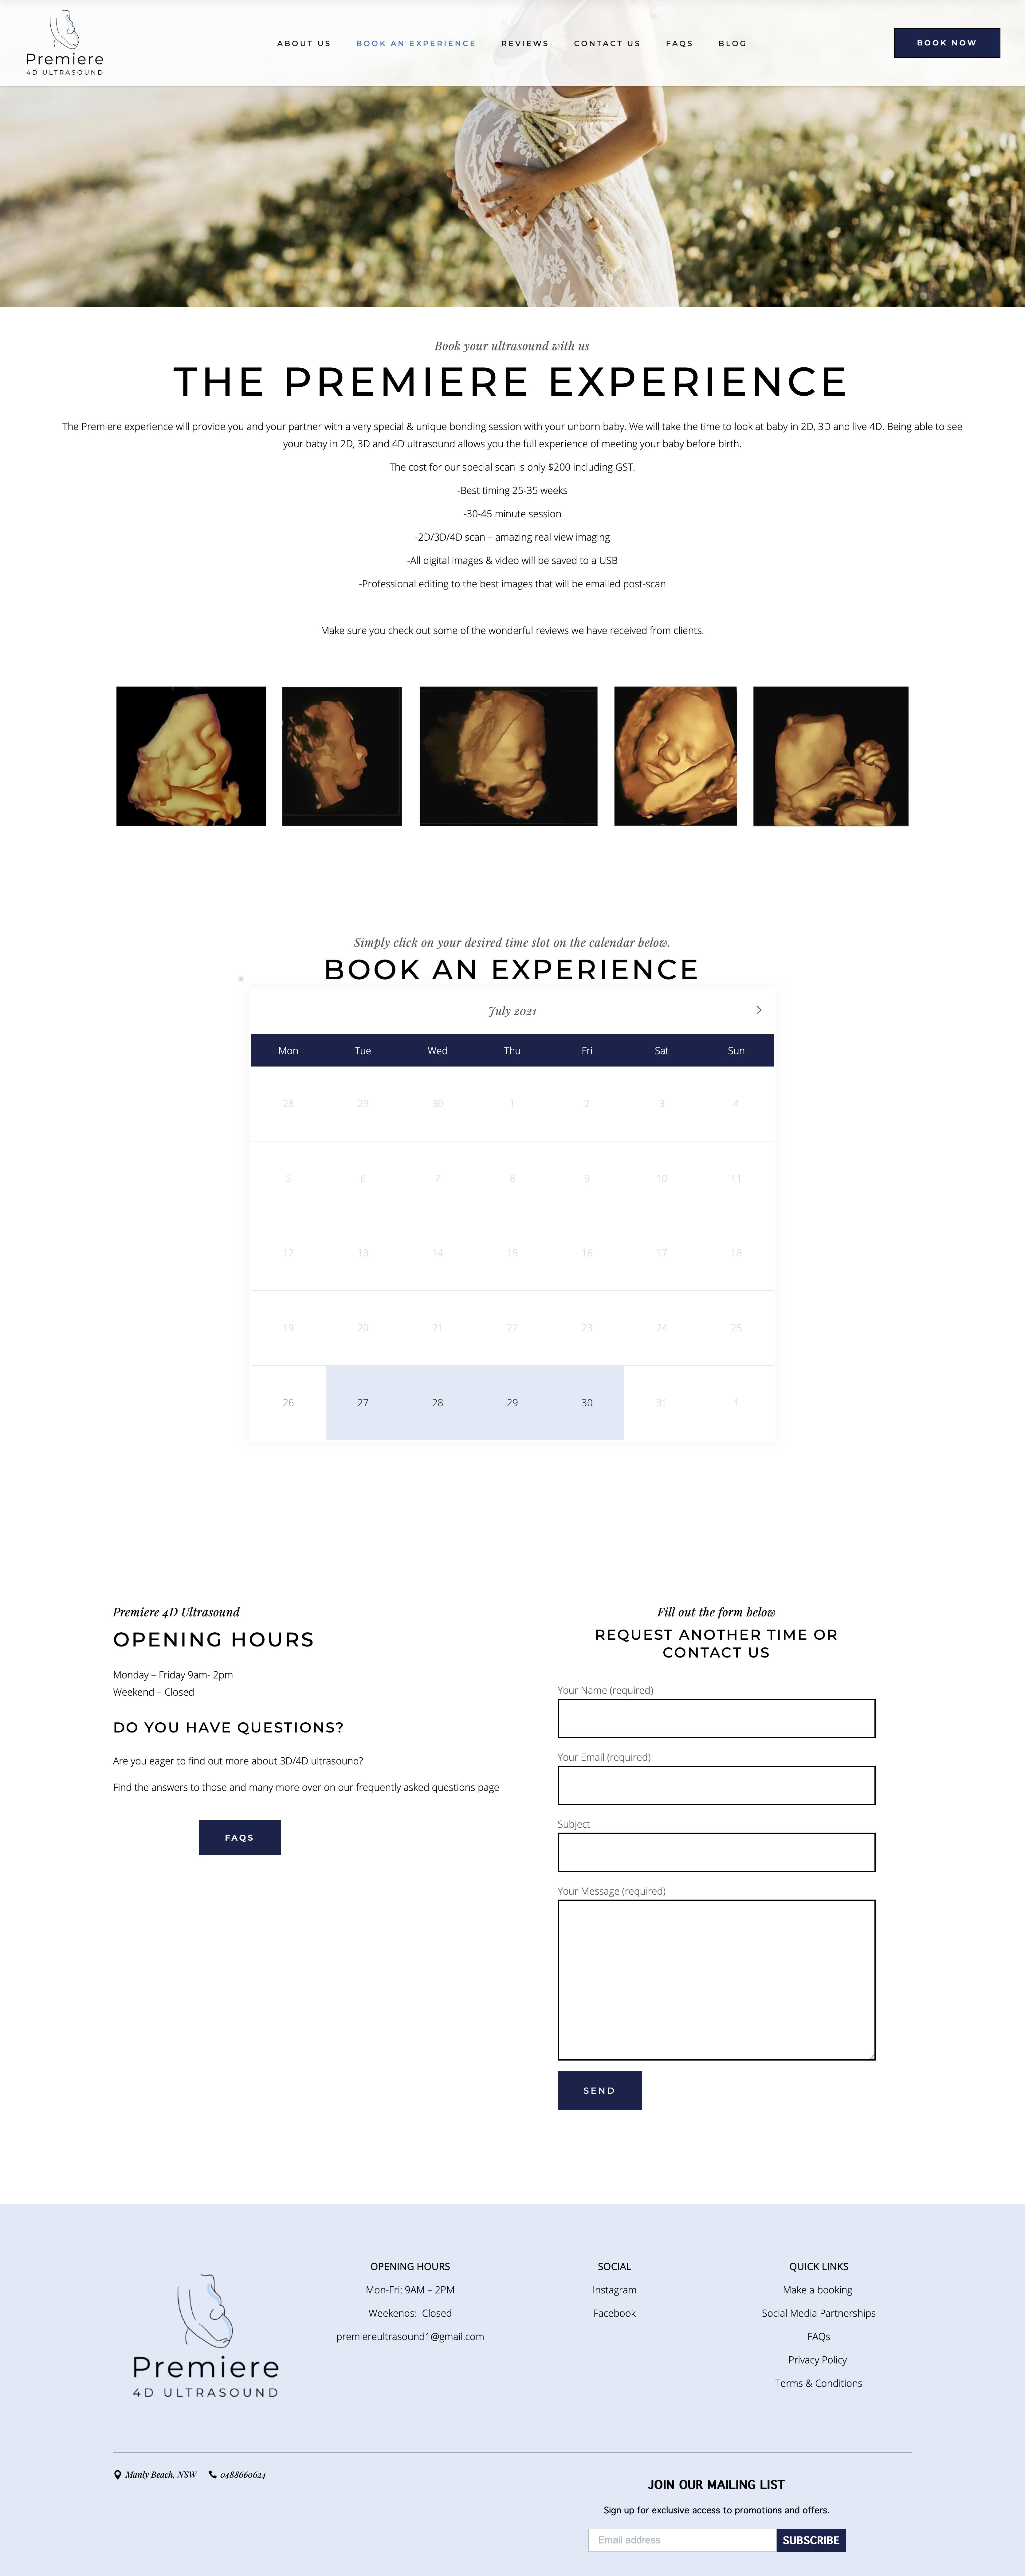 Booking – Premiere 4D Ultrasound